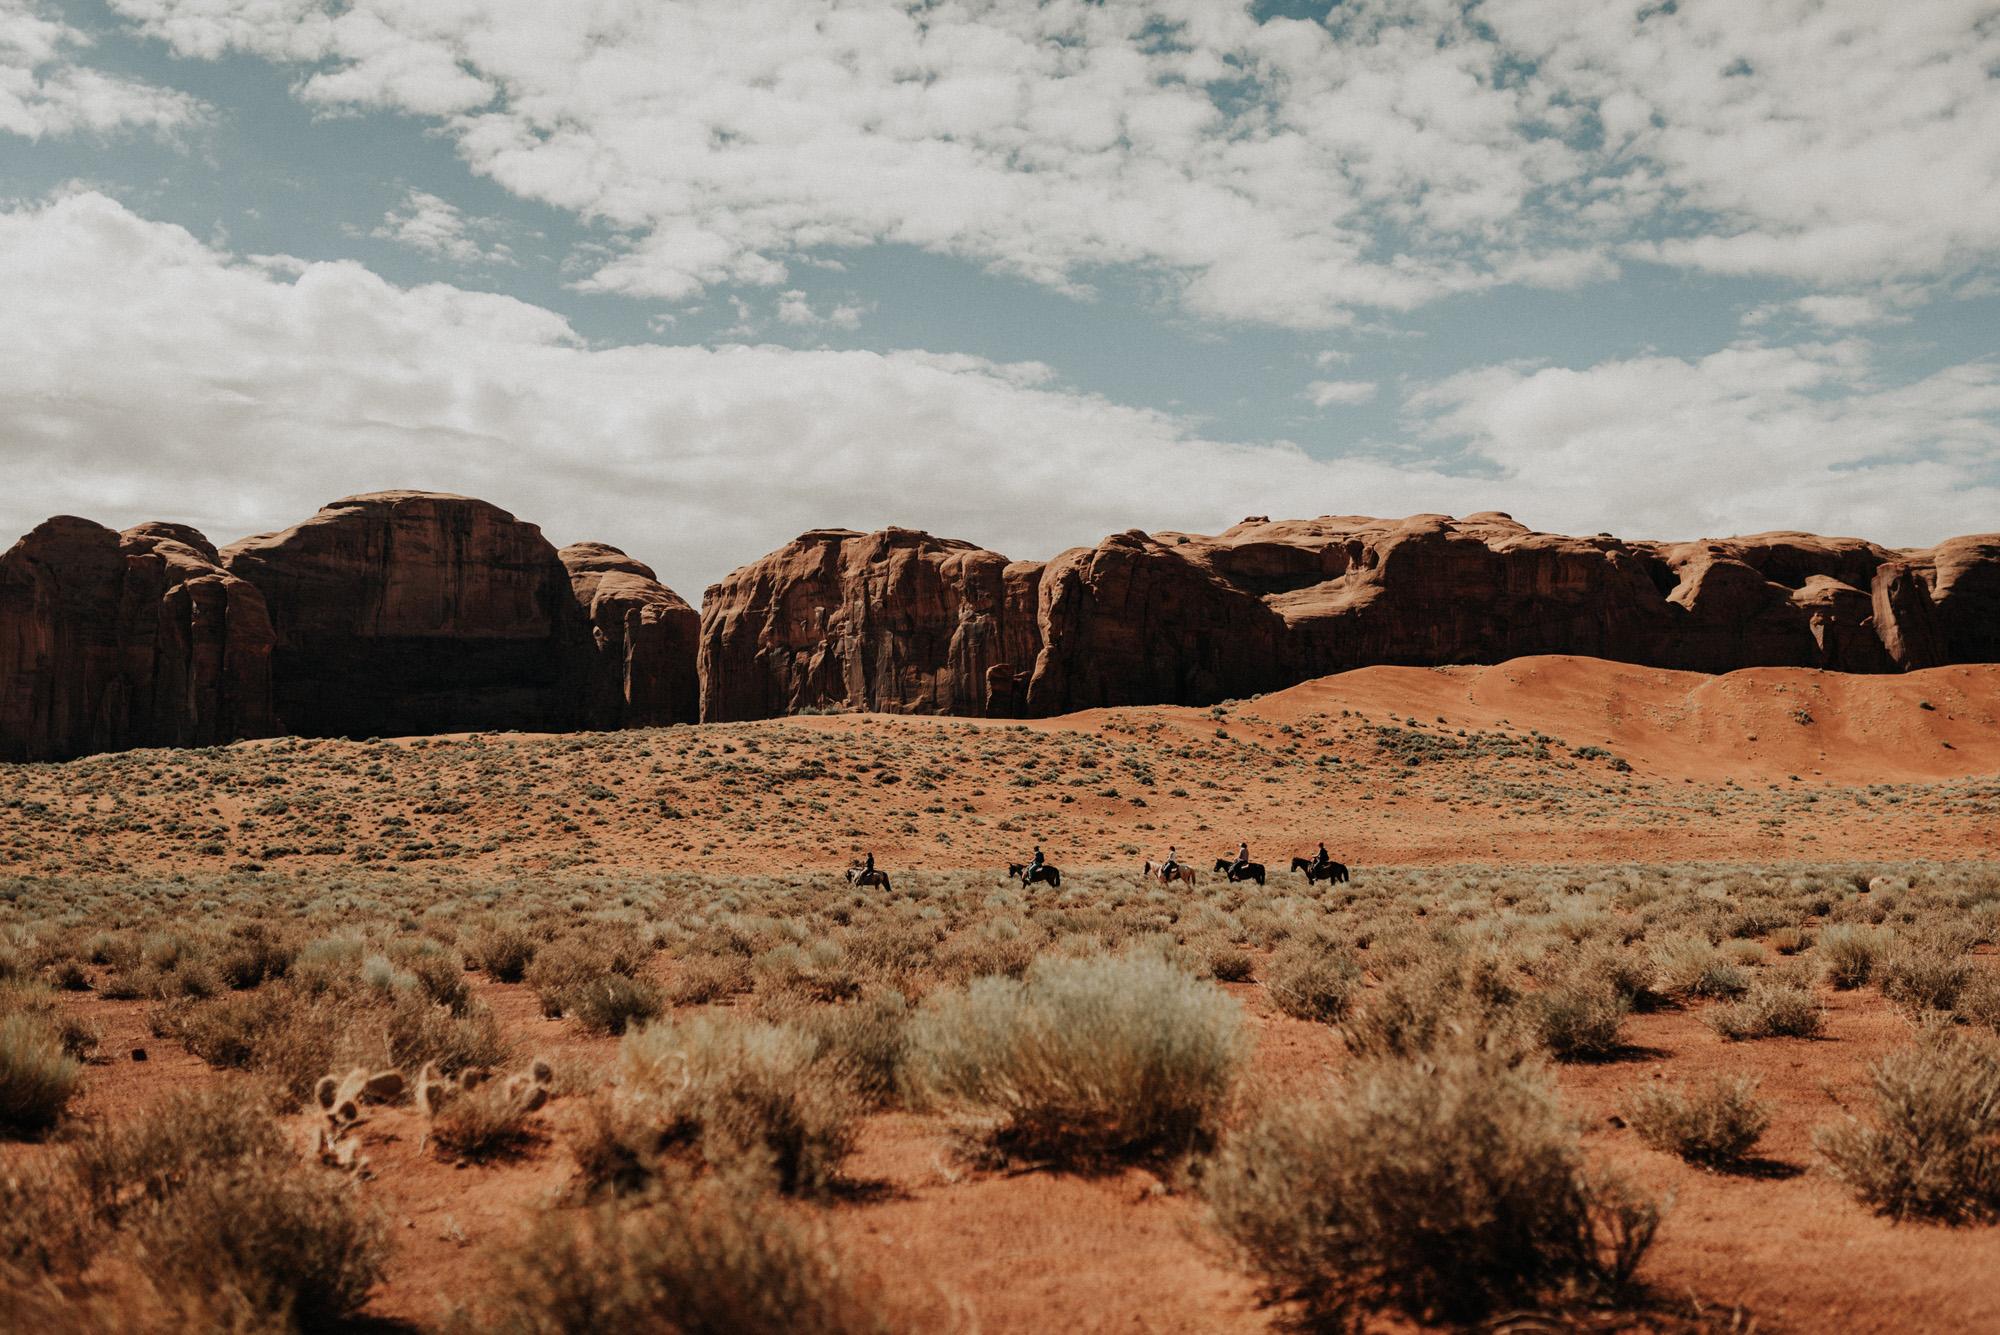 monument valley utah ut kylewillisphoto demurela horseback riding